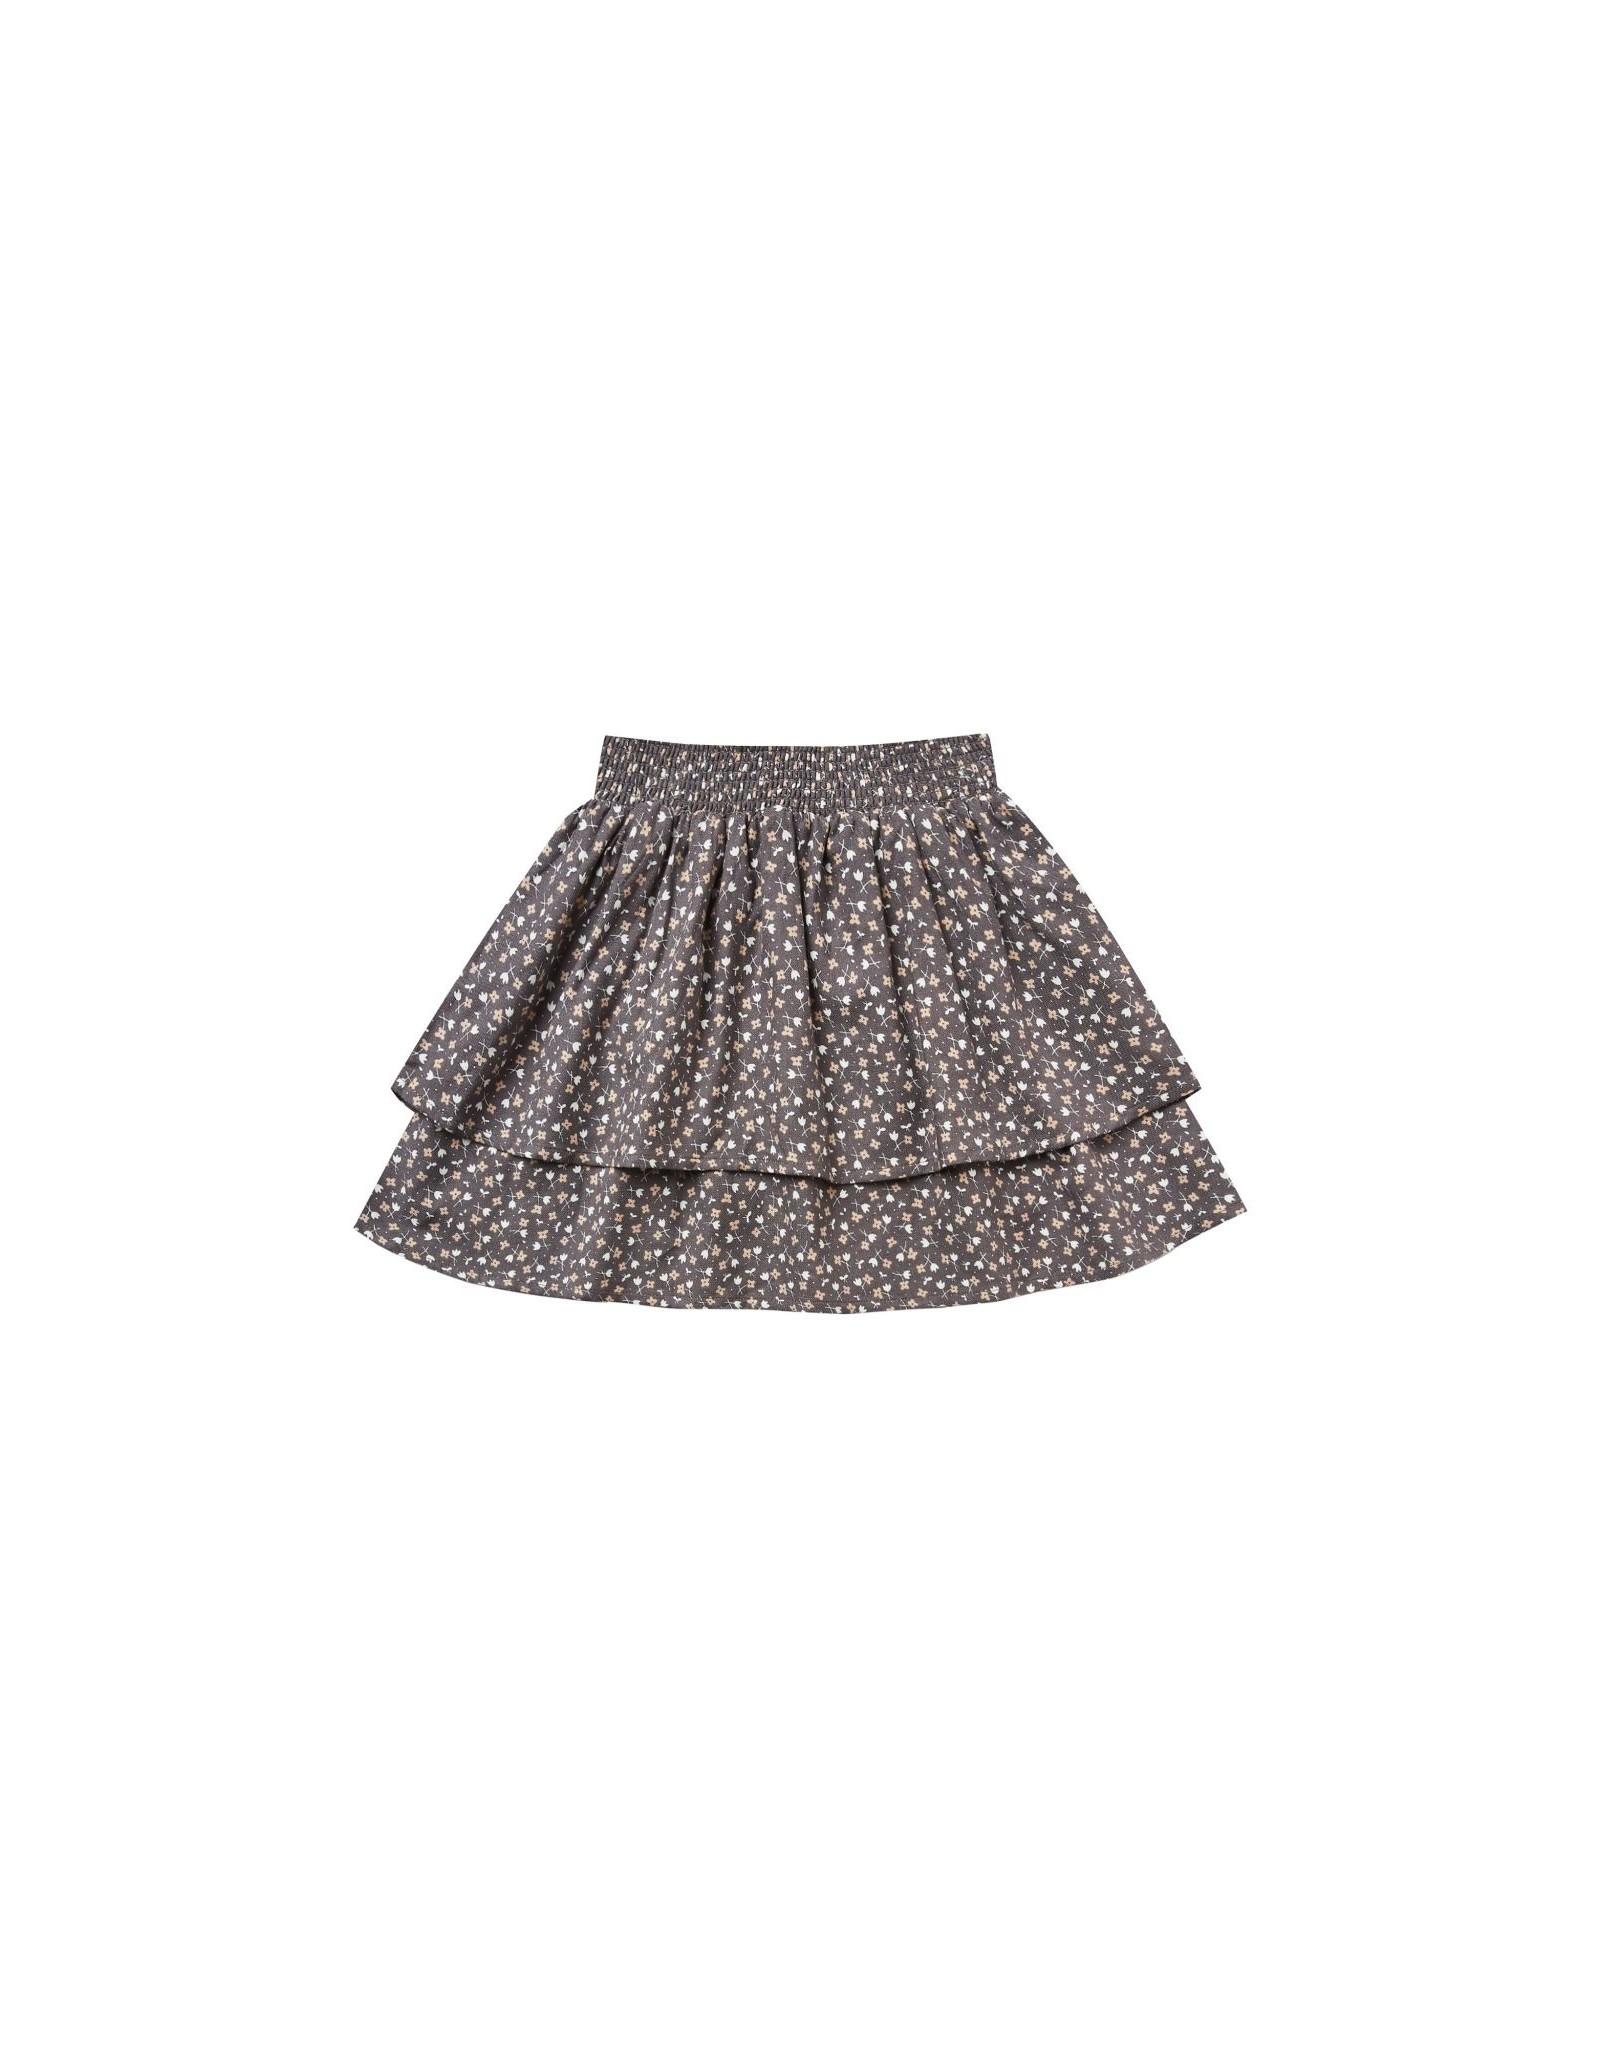 Rylee and Cru ditsy tiered mini skirt- indigo